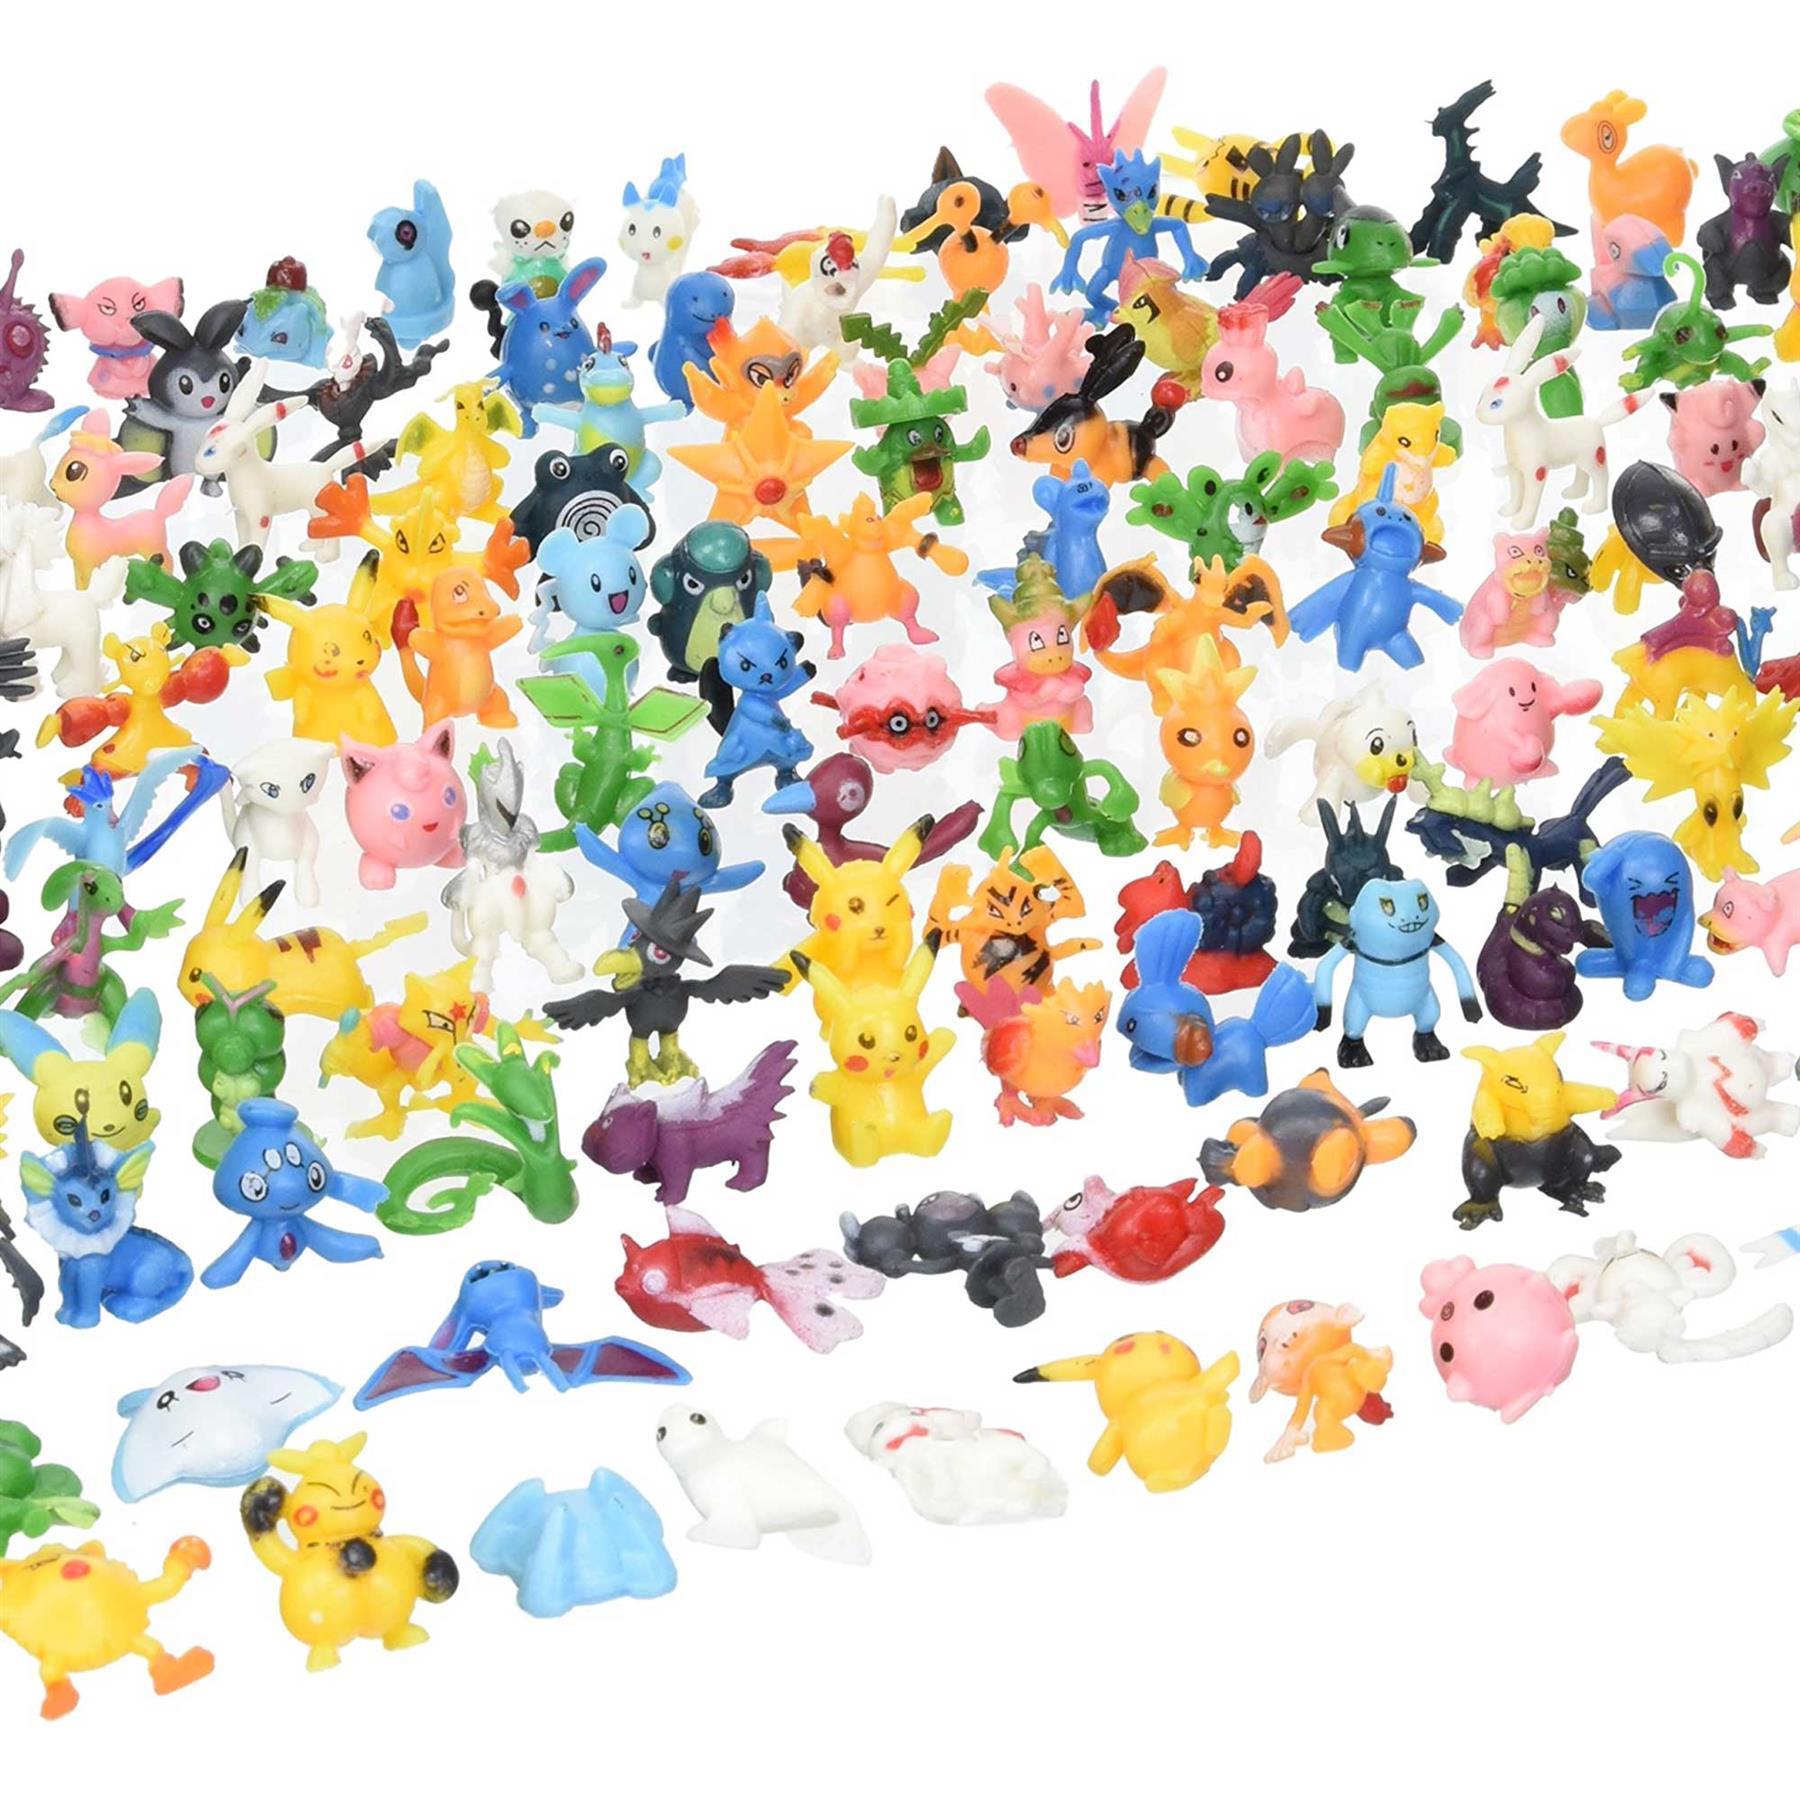 12pcs Mini Dragon Toys Assorted 3 To 4 cm action figures Birthday Cake Topper